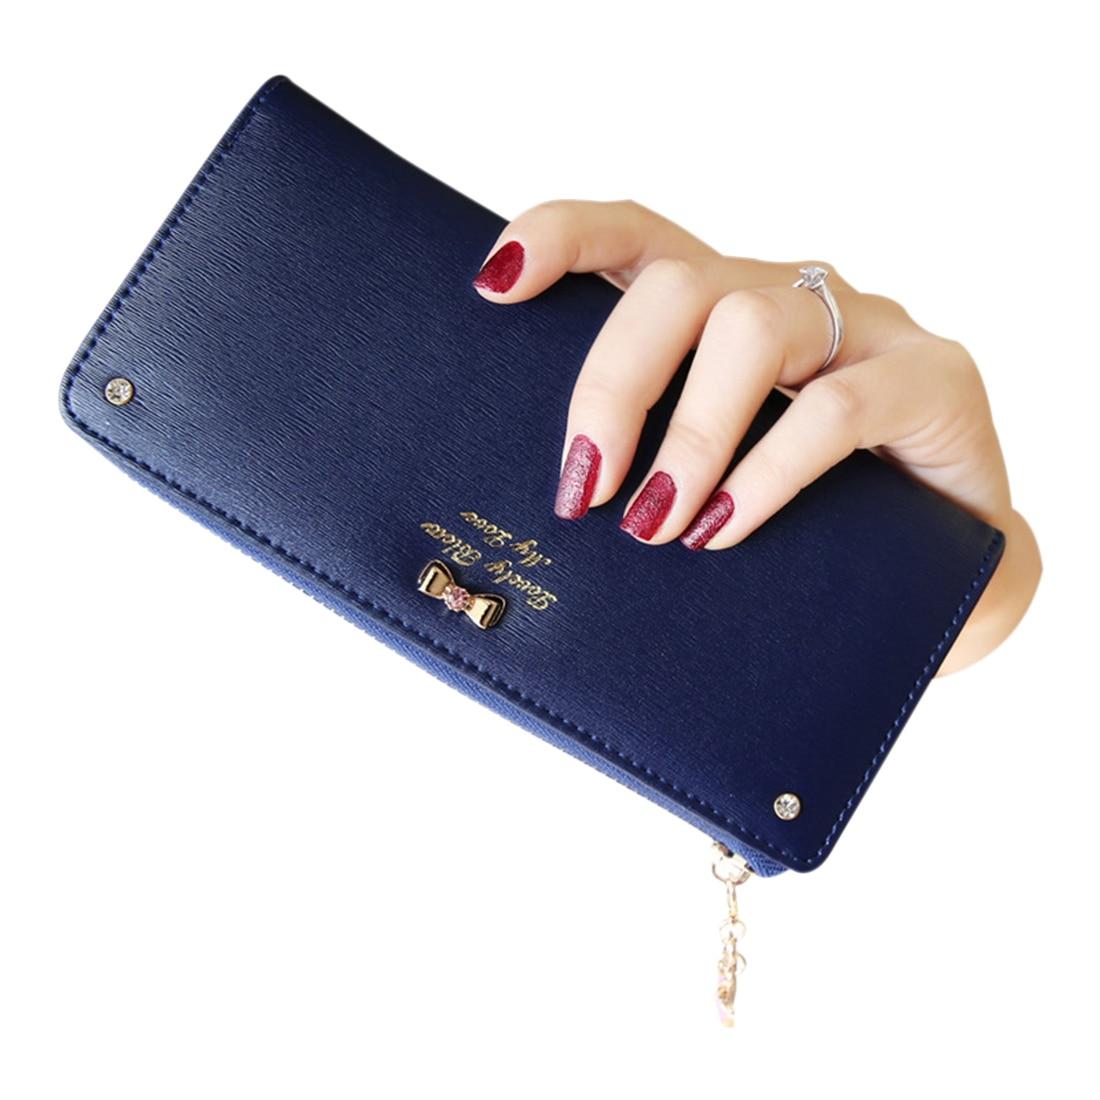 FGGS bowknot pendant PU Leather Long Design Women Wallet Coin Purse Ladies Handbag Day Clutch Bag(Navy Blue)